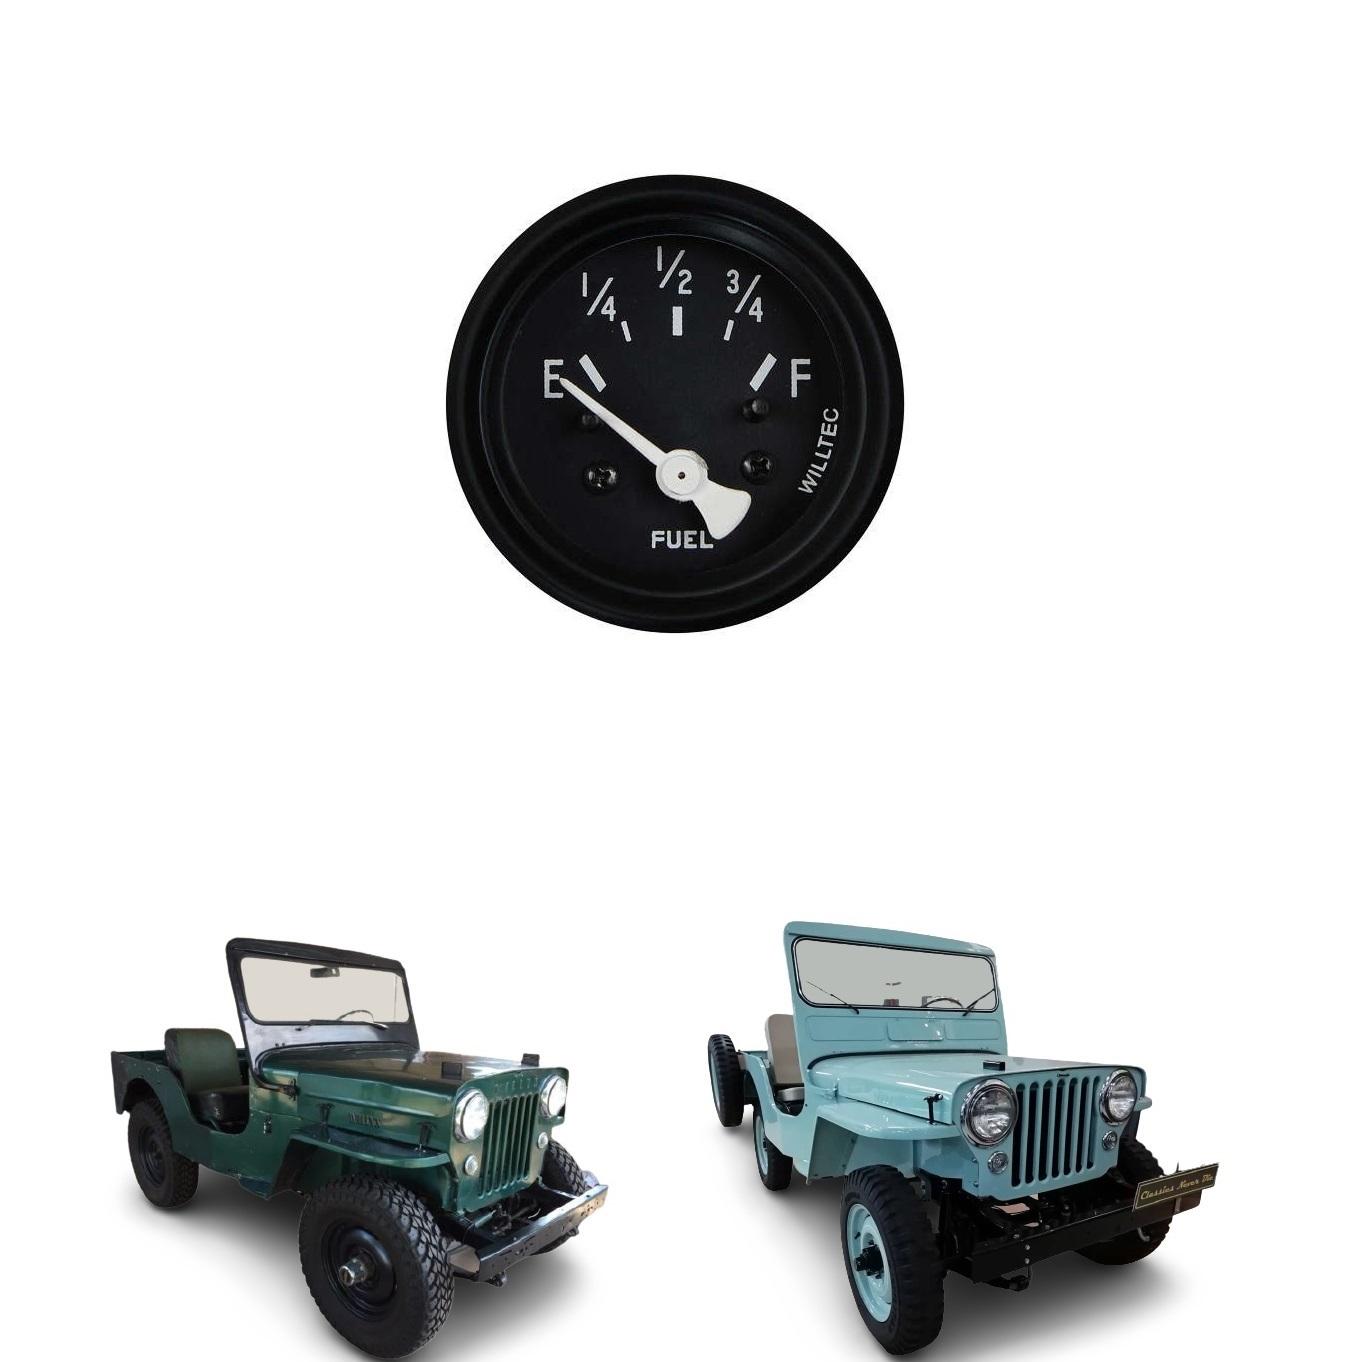 MARCADOR DE COMBUSTÍVEL JEEP WILLYS 1946 / 1954